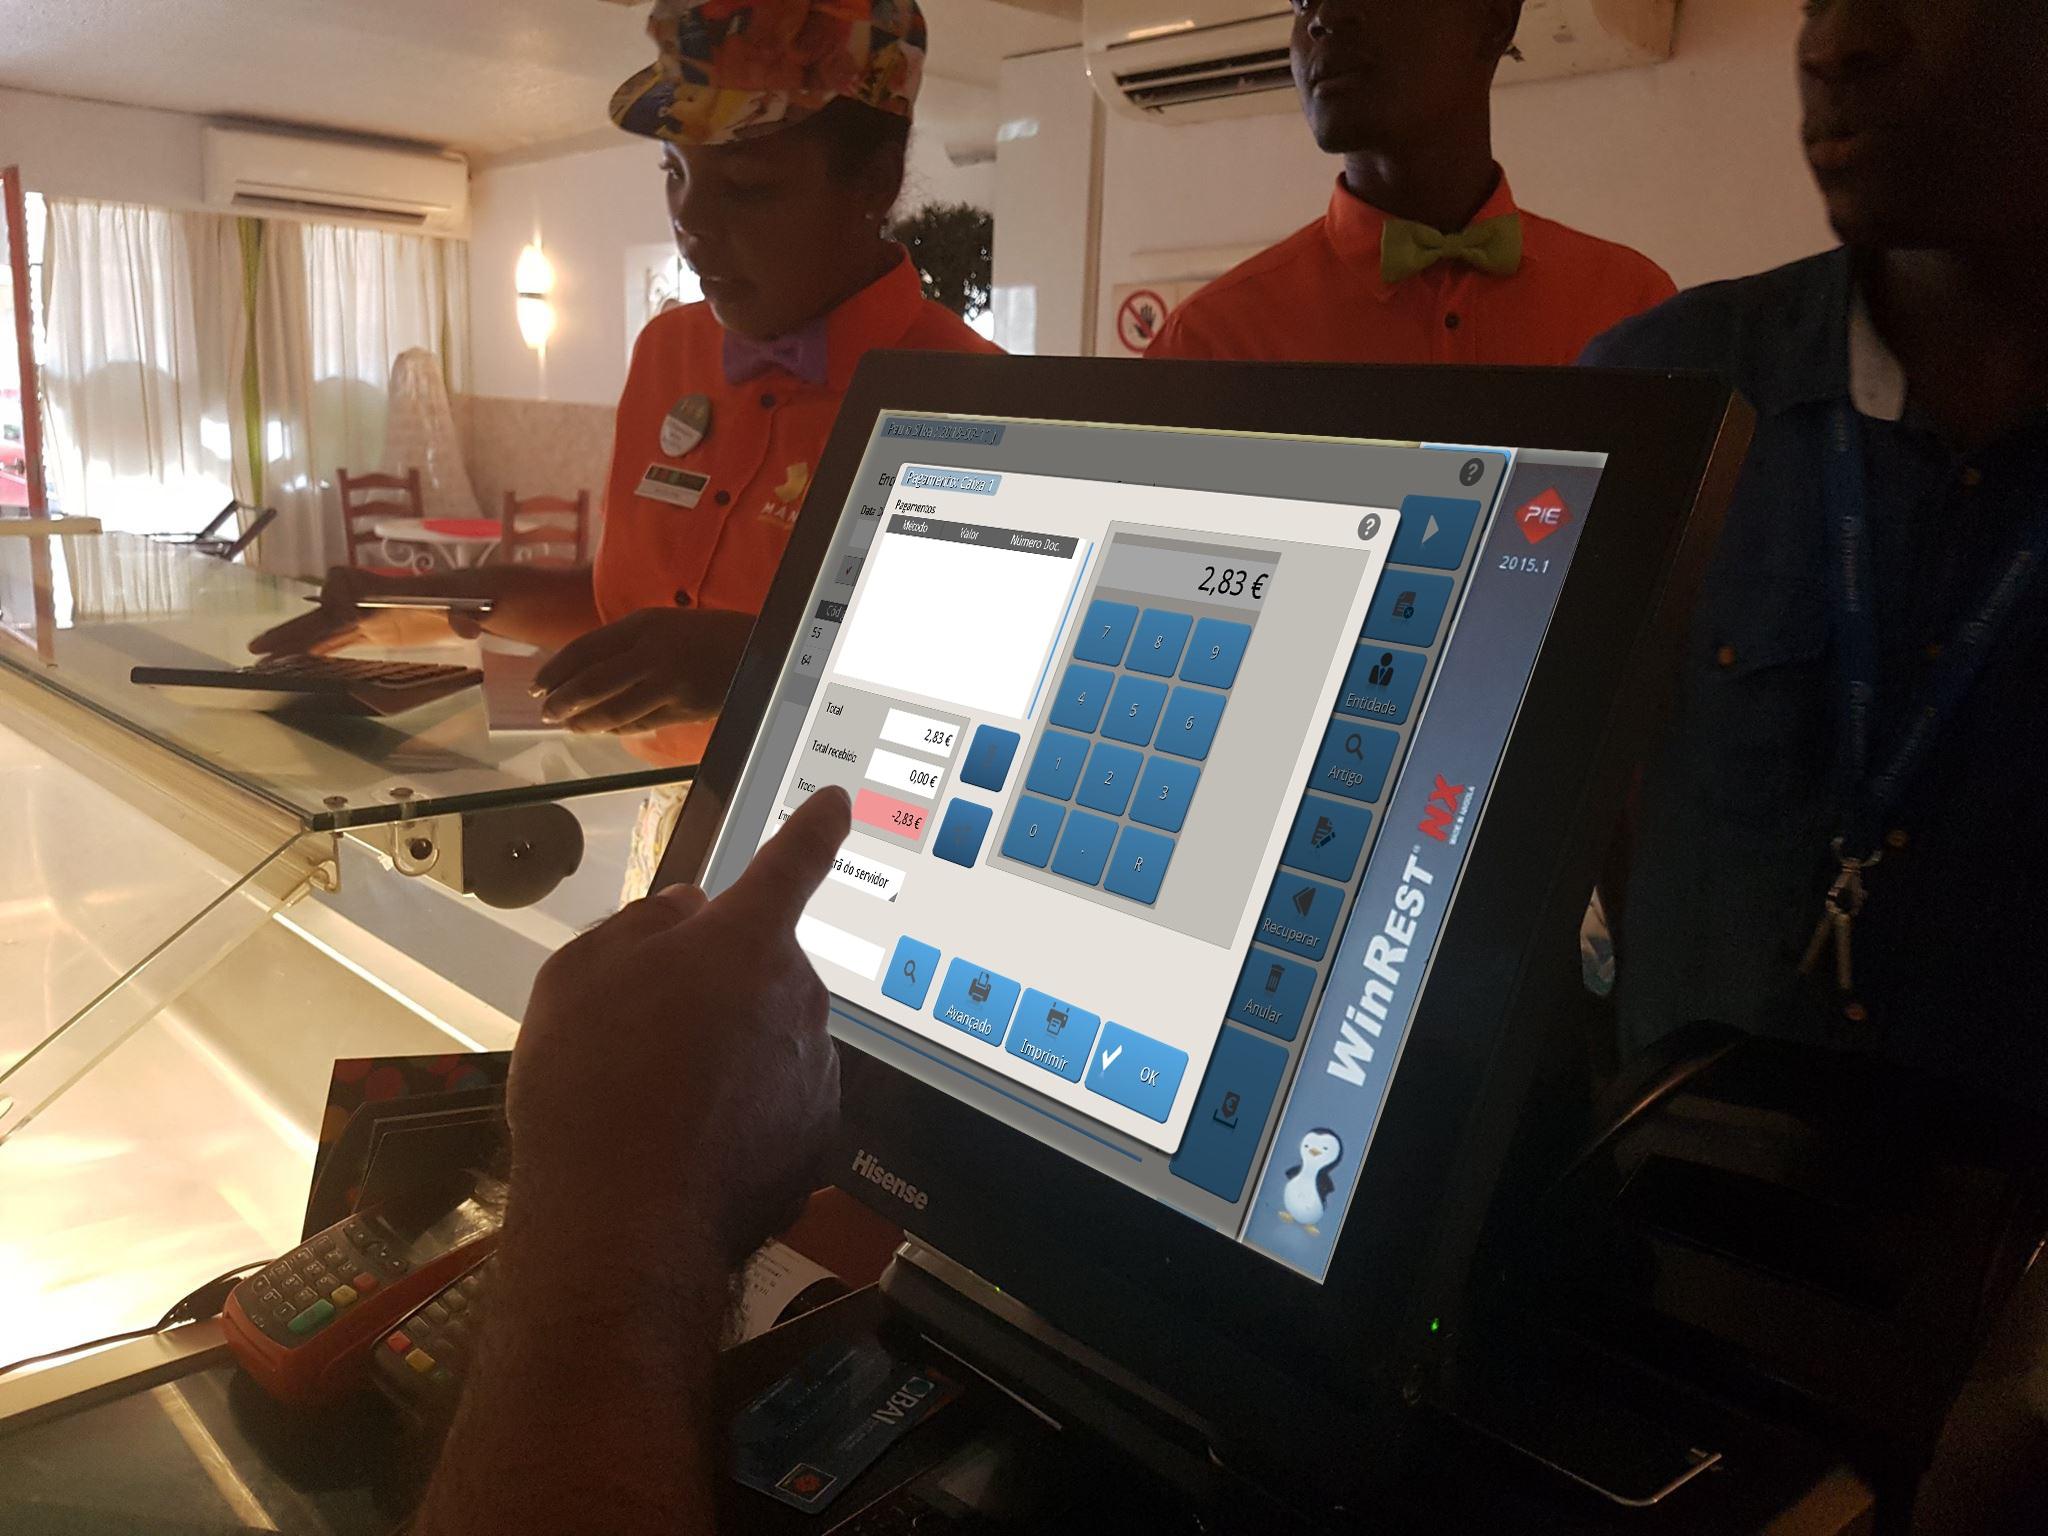 WinRest 360 - Restaurante com software WinRest NX